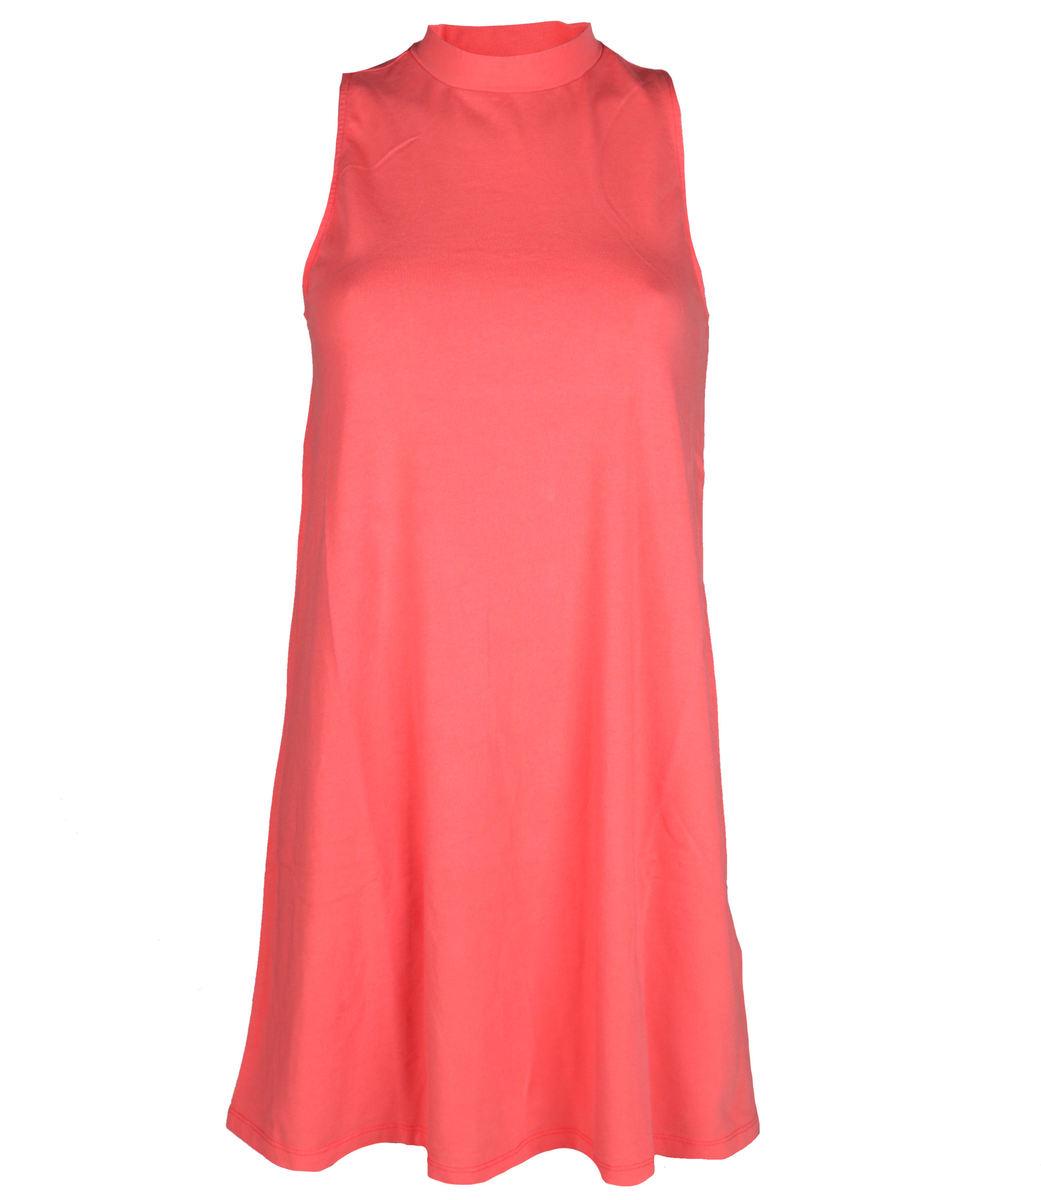 šaty dámske VANS - WM CARMEL - Spiced CORAL - VA3IOGP37